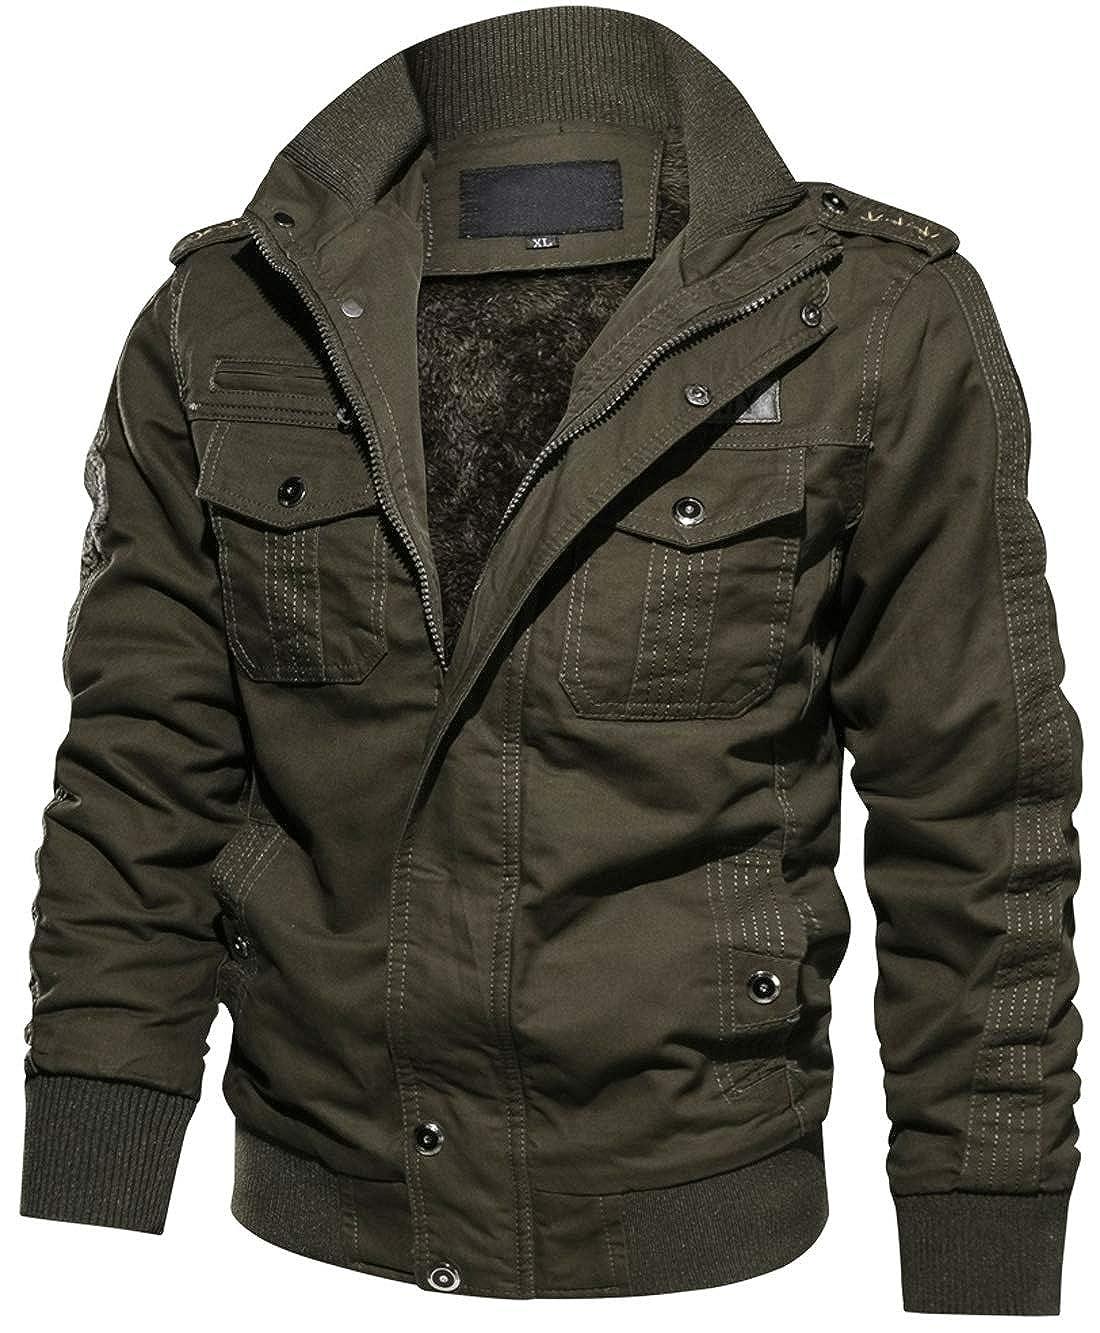 ad693fa98 chouyatou Men's Sportswear Full Zip Sherpa Lined Military Outerwear Bomber  Jacket